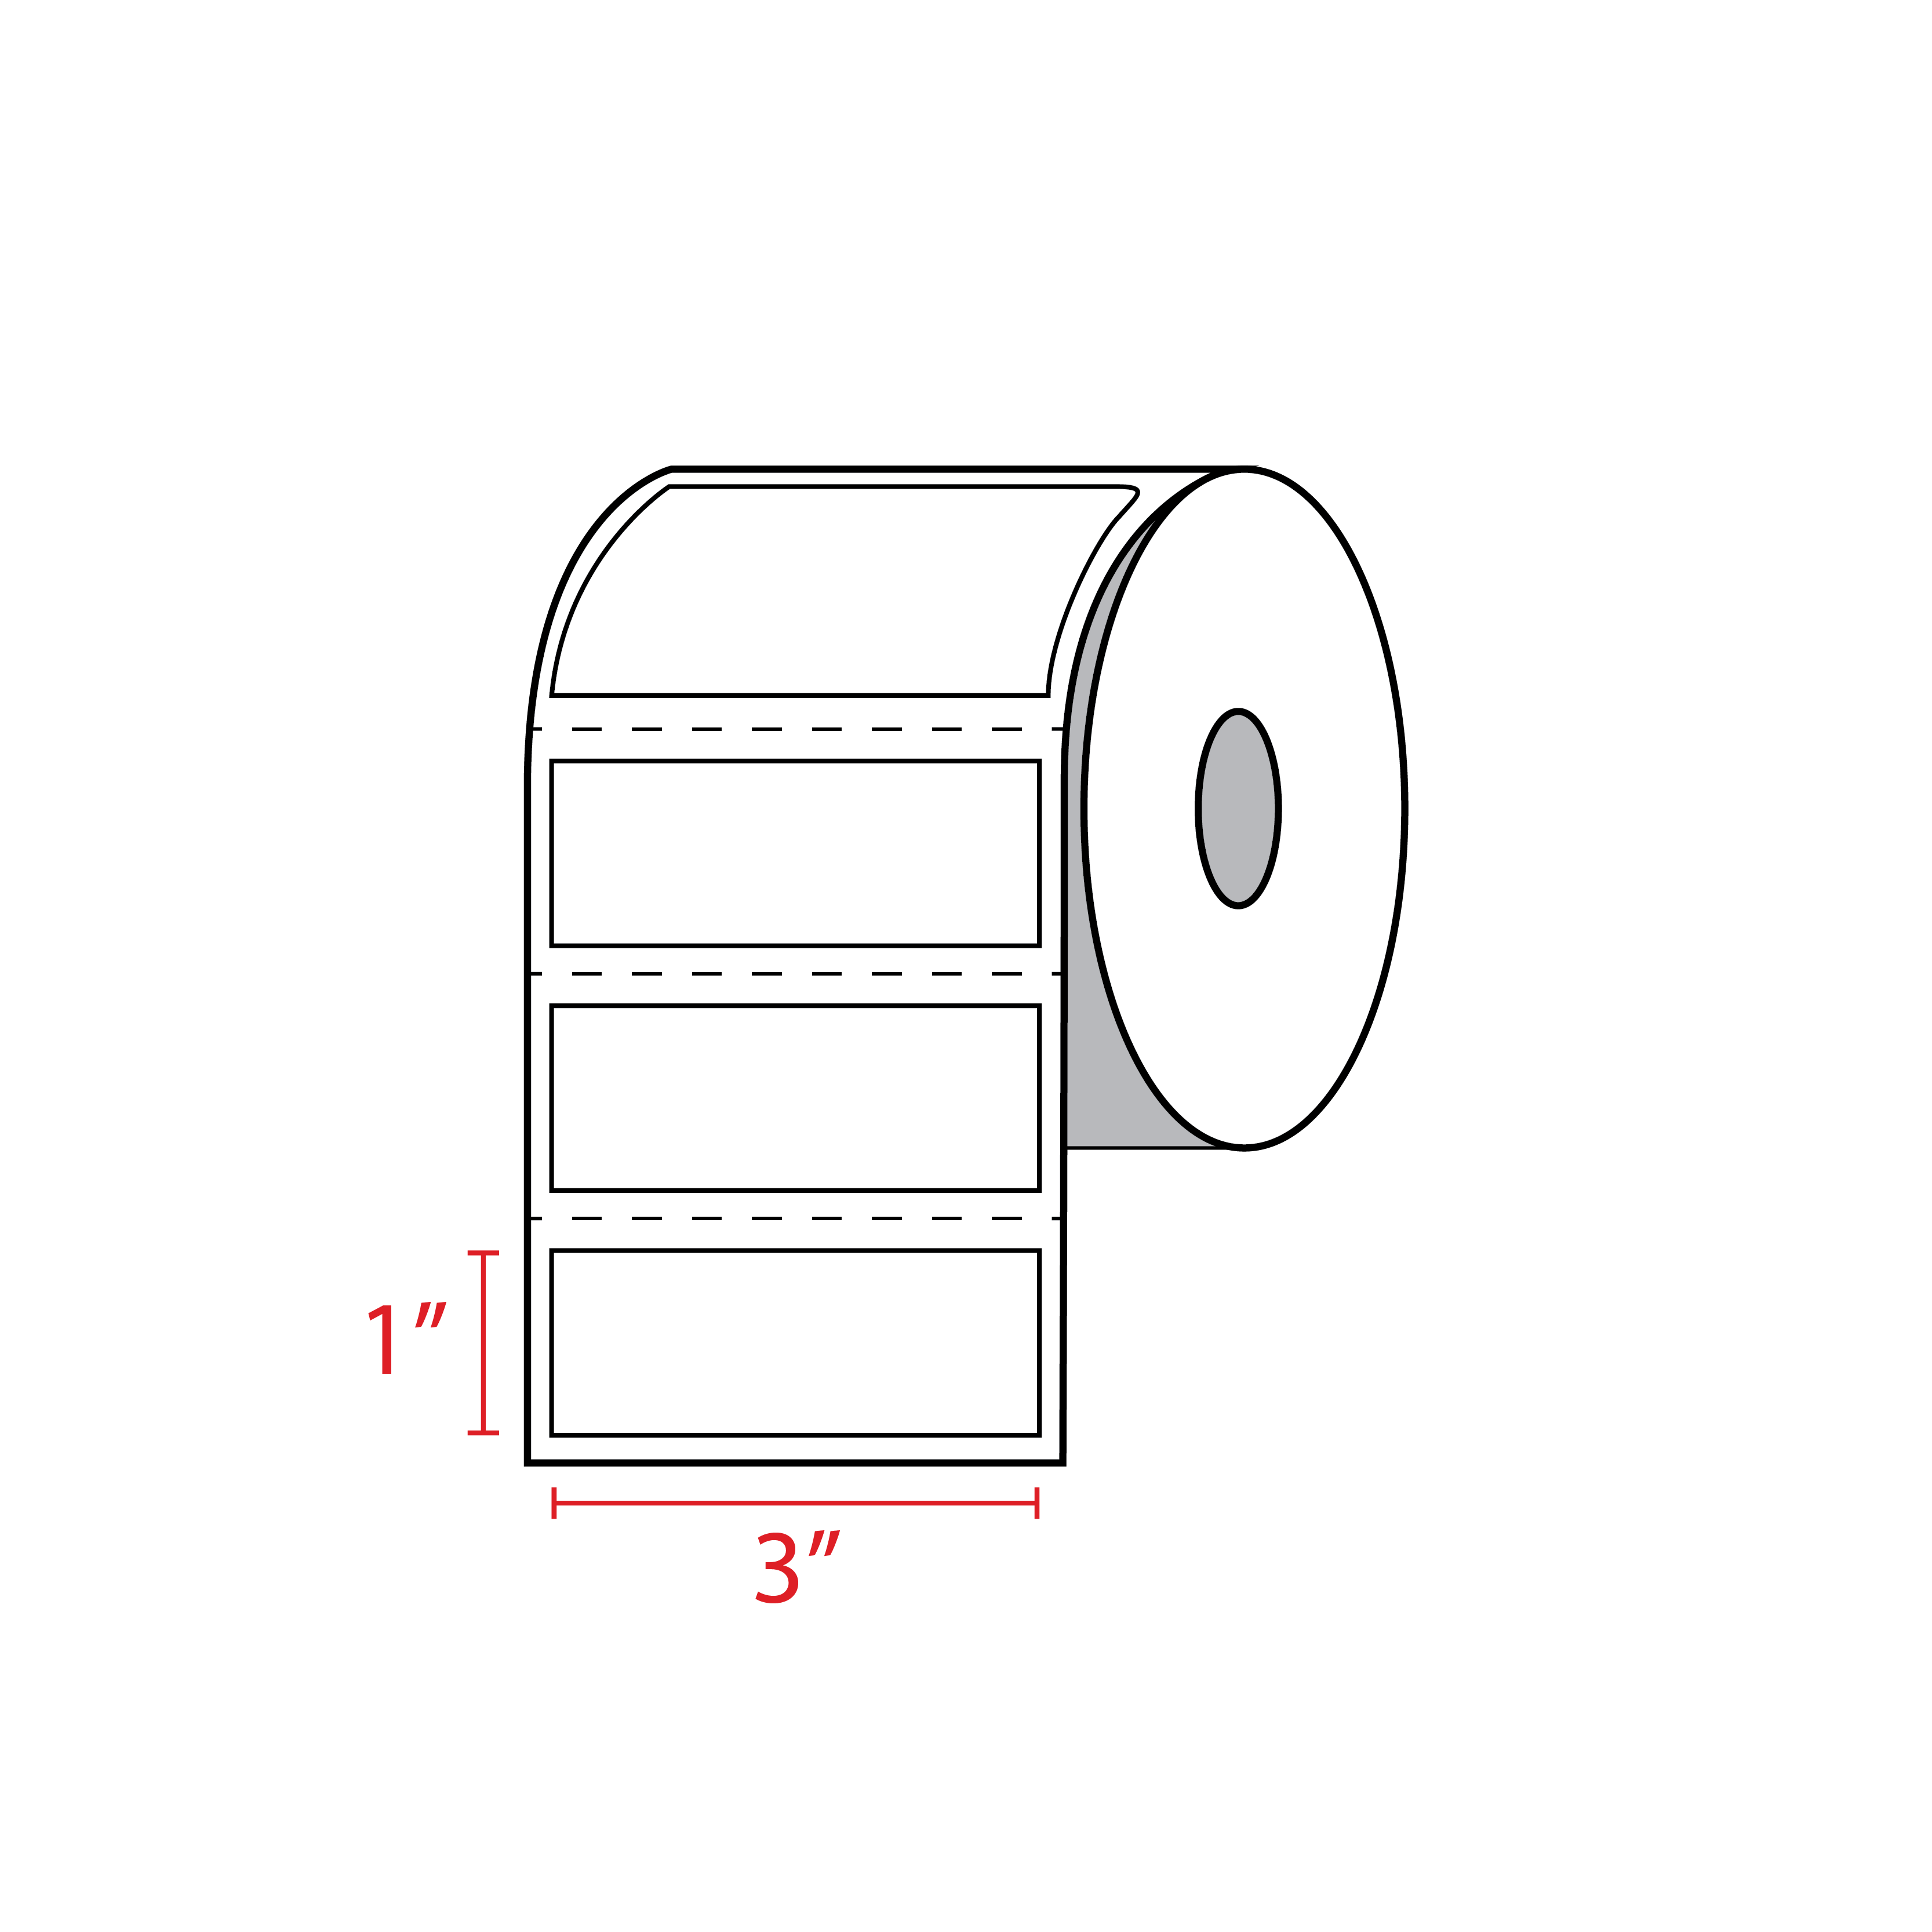 Zebra Labels 3x1 Barcode Sticker Thermal Label Roll 10010043 | Zebra